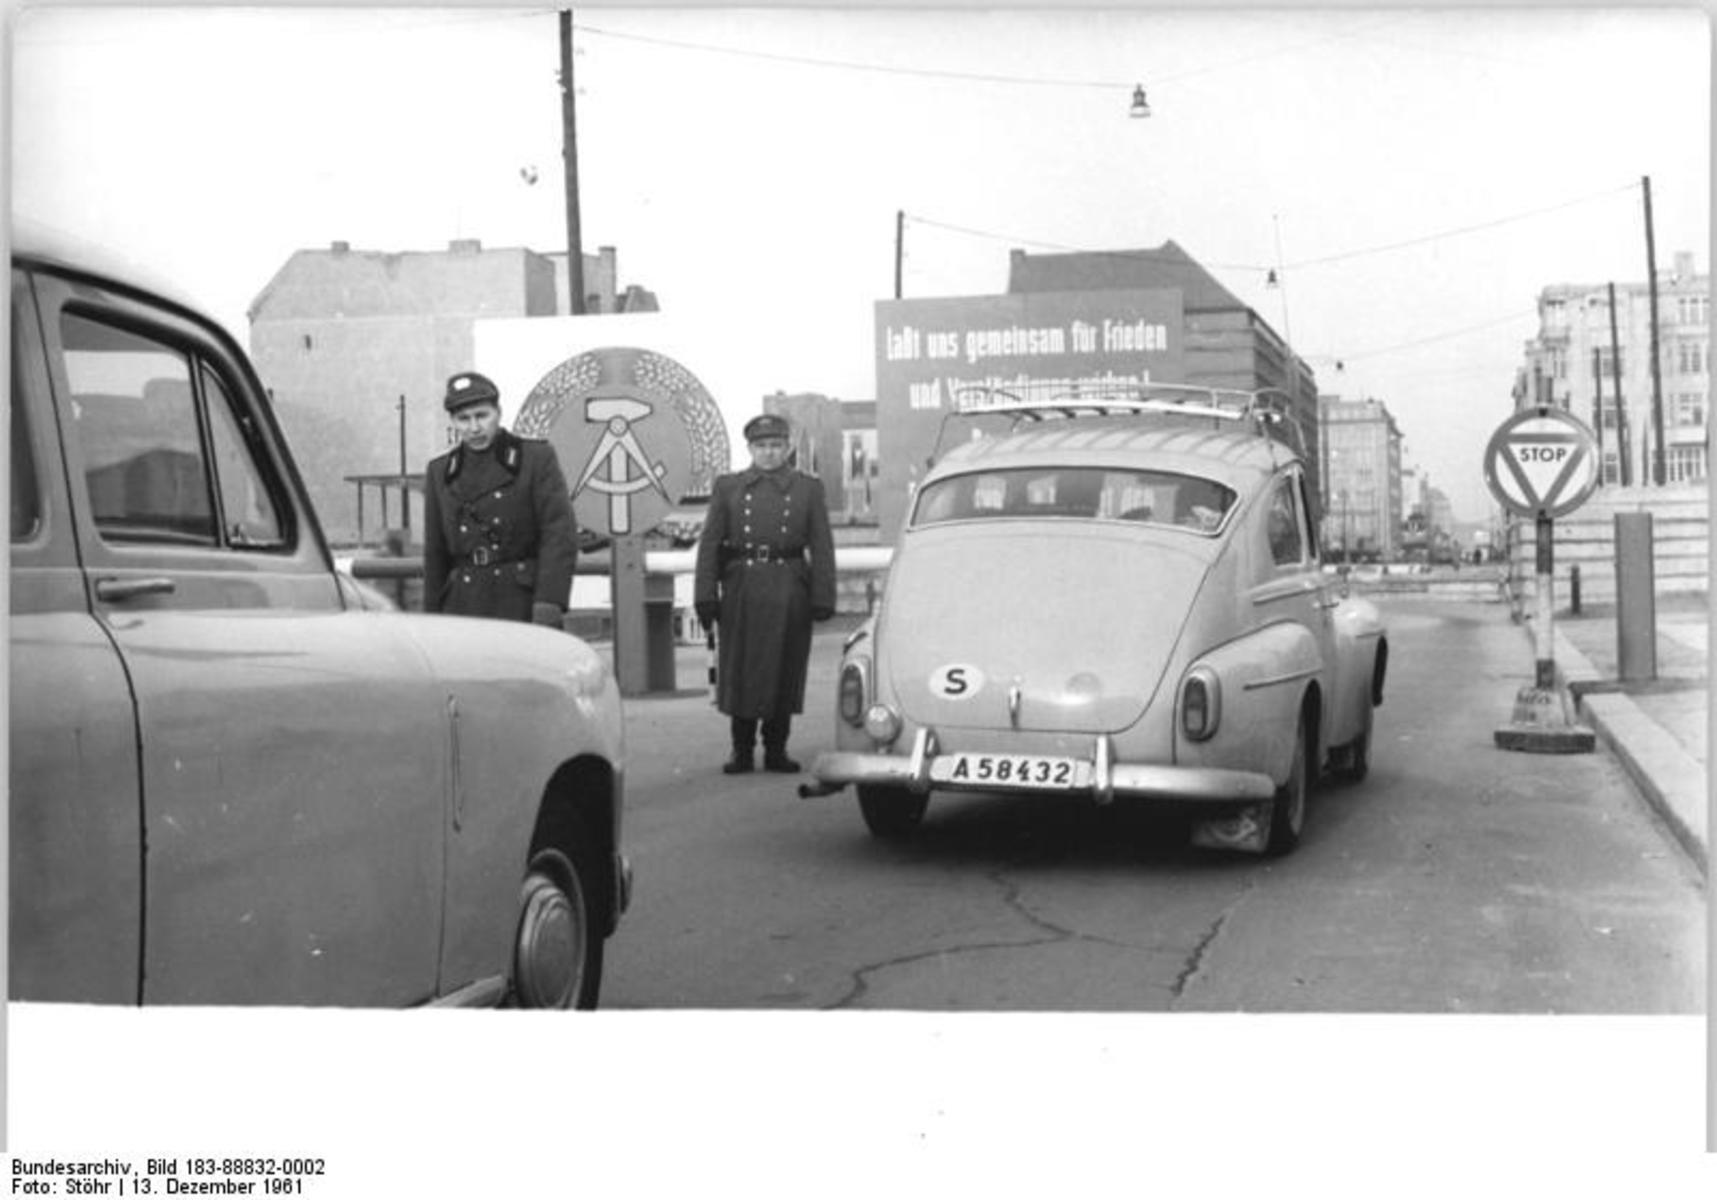 Bundesarchiv_Bild_183-88832-0002,_Berlin,_Mauerbau,_Friedrichstraße.jpg